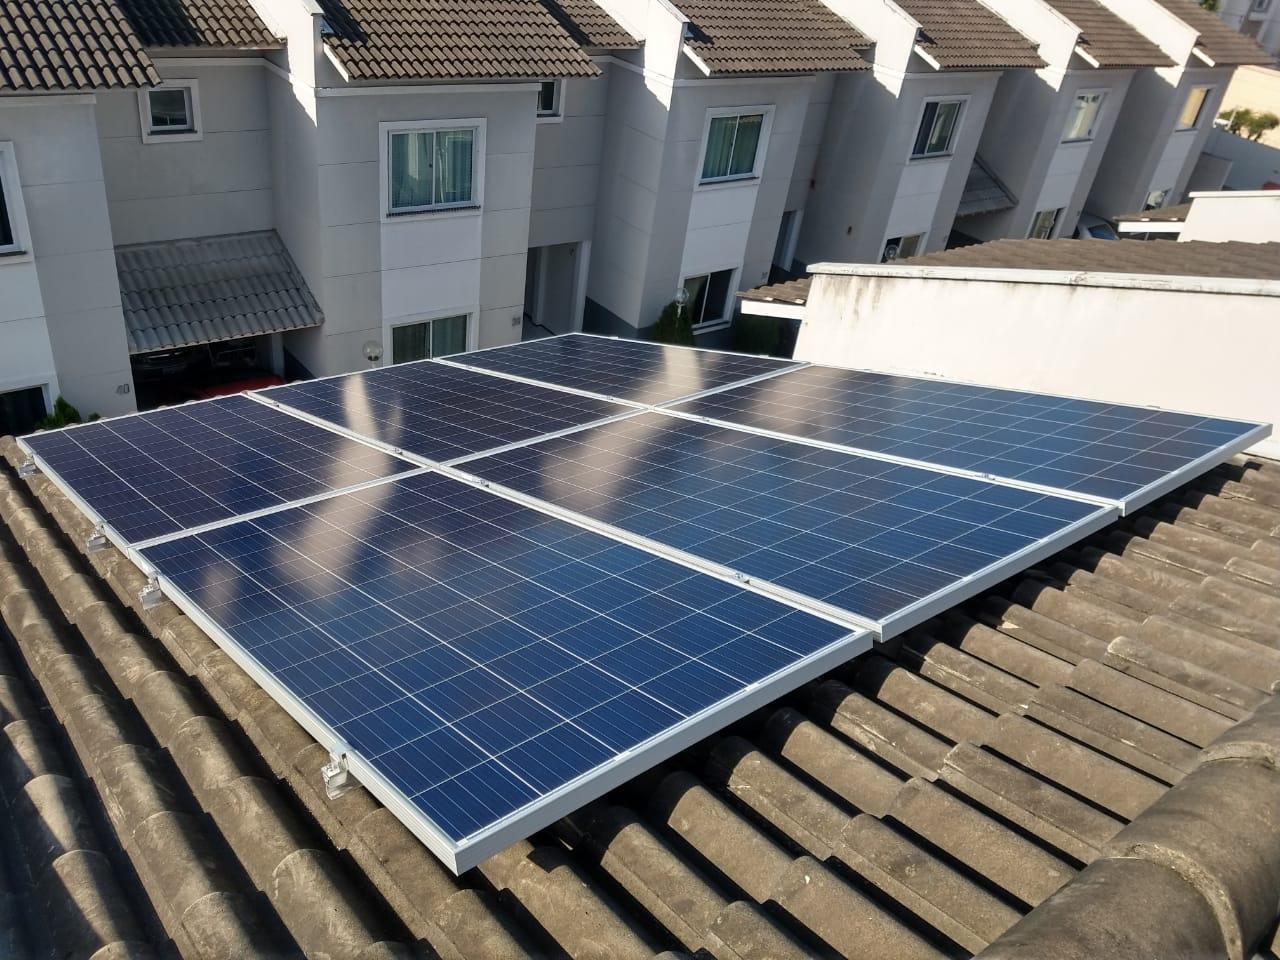 Kit fotovoltaico de 3,63kwp